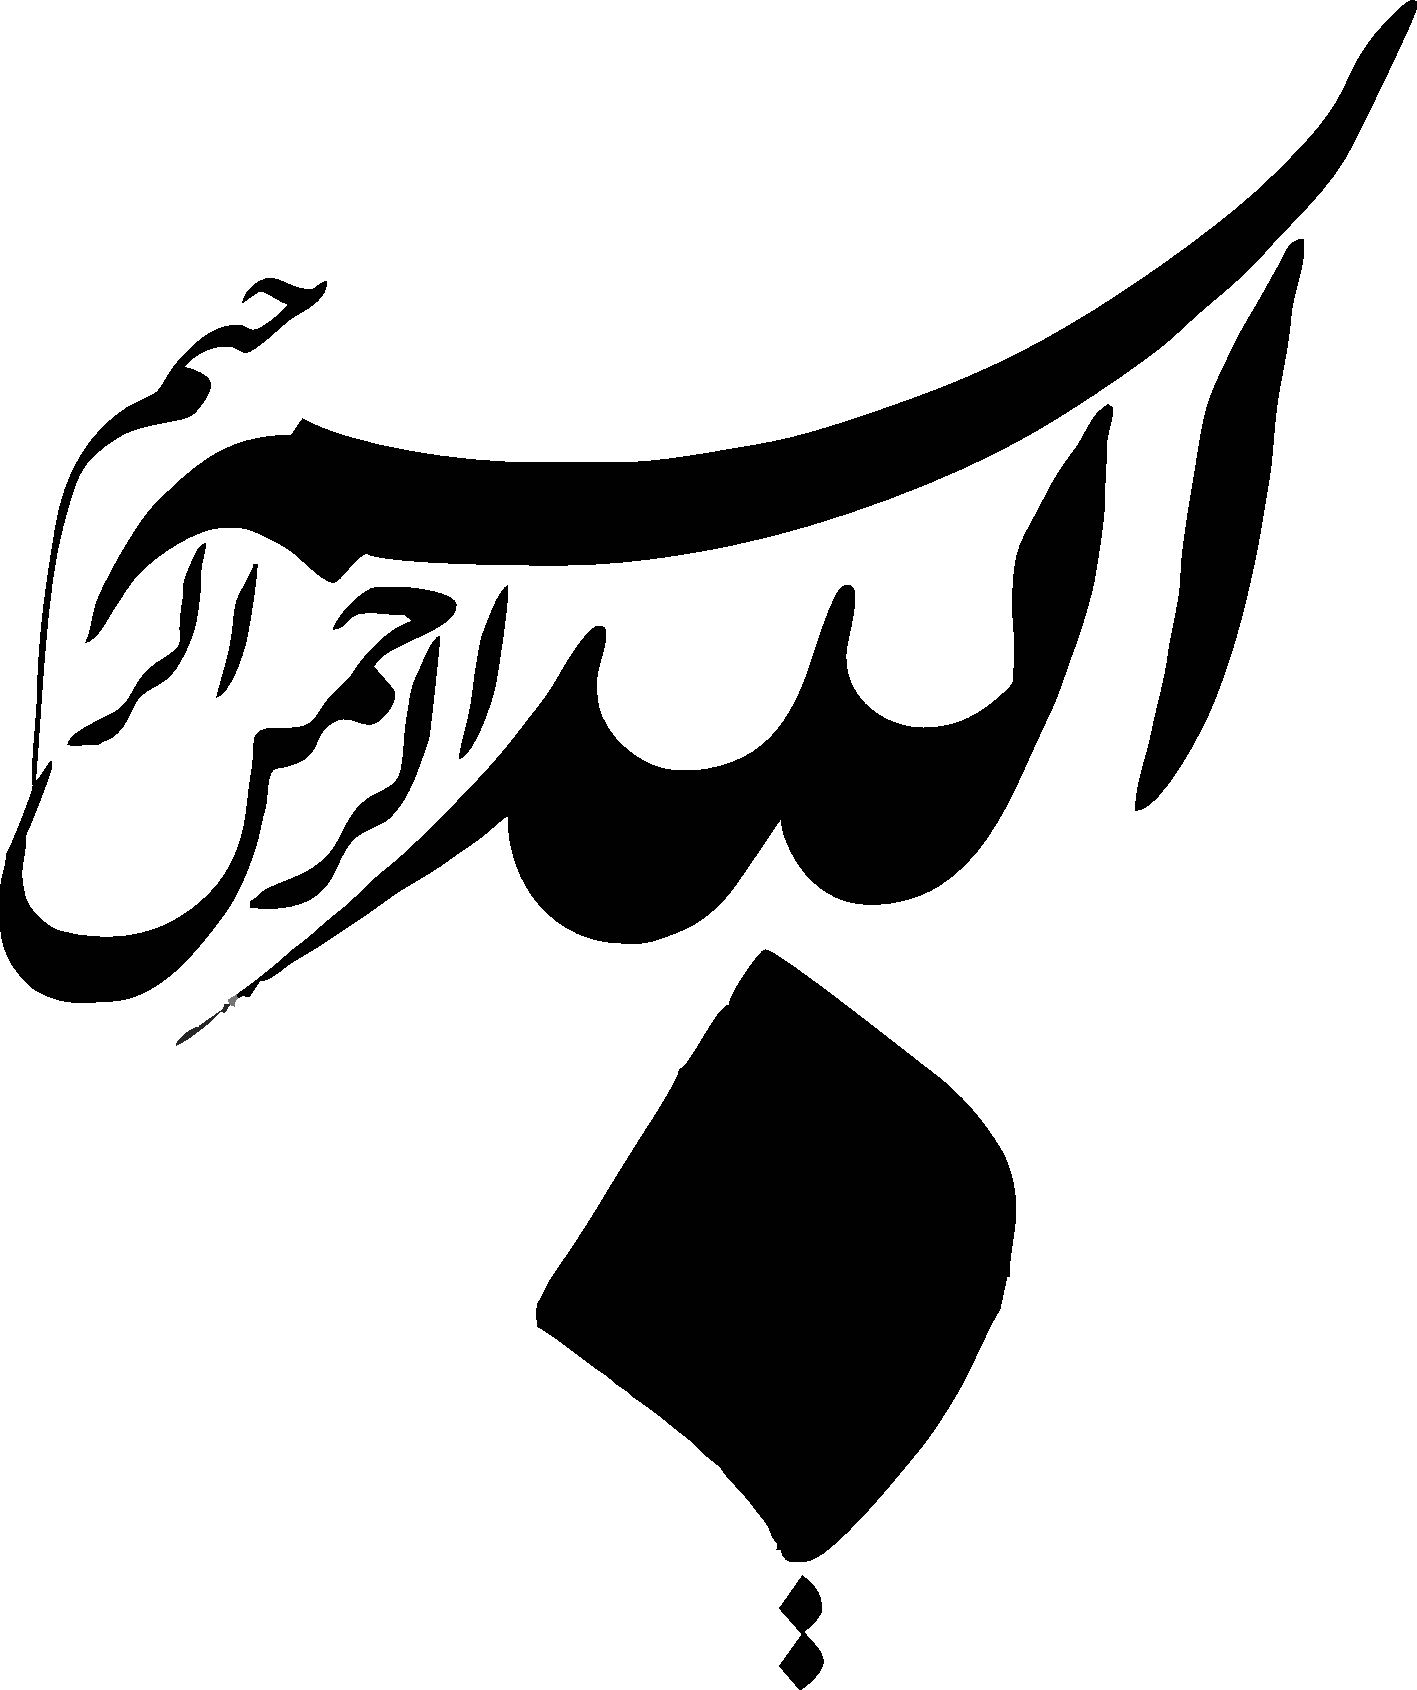 pictures-besmellah-www-mjjz_-ir-260